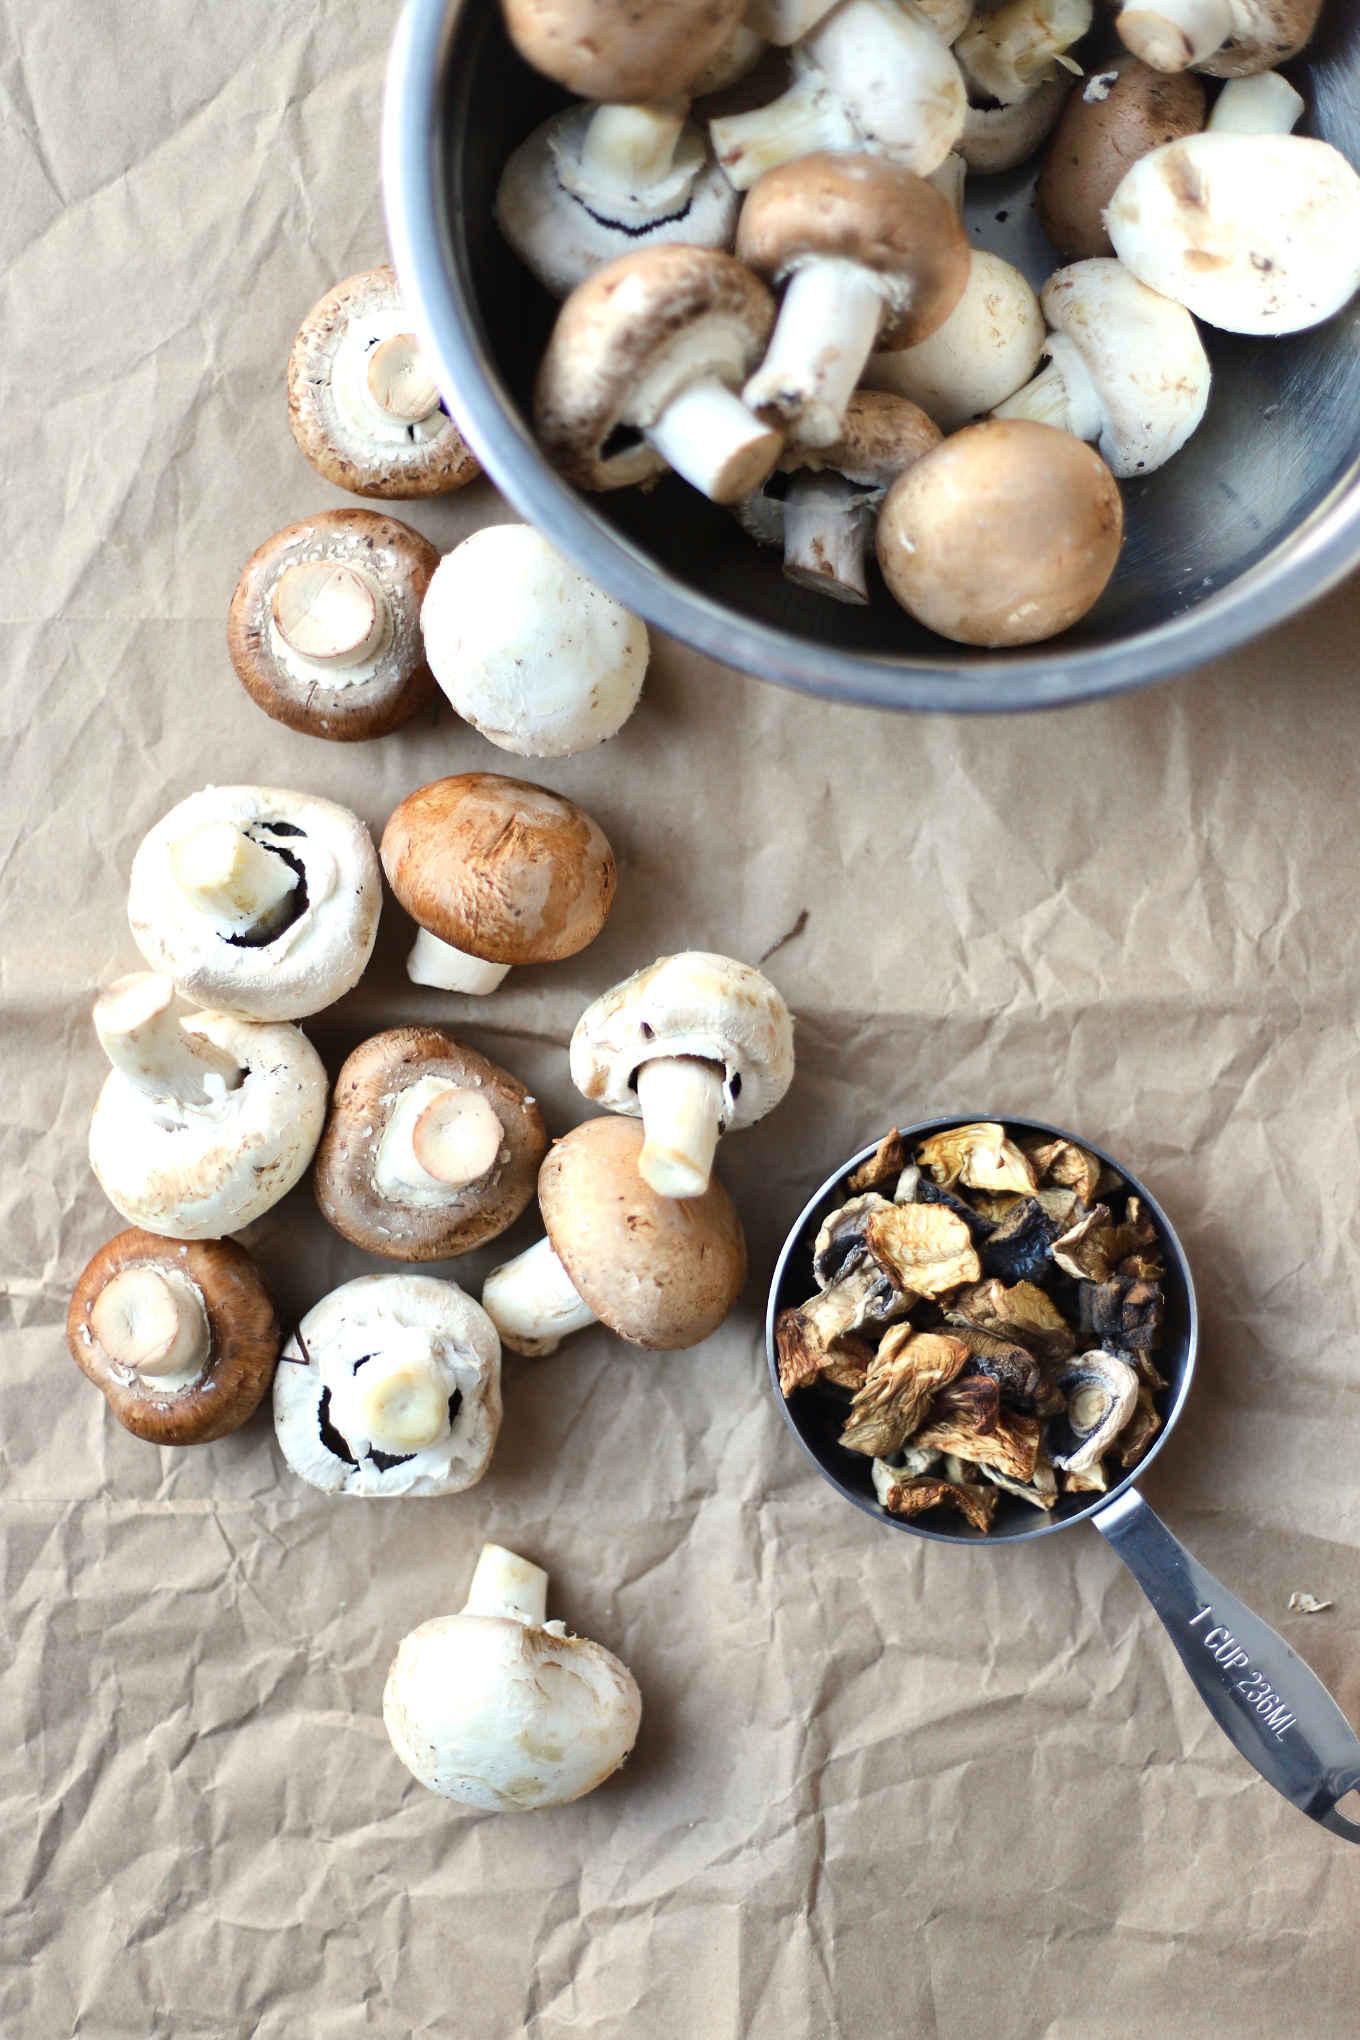 a mixture of fresh mushrooms and dry mushrooms